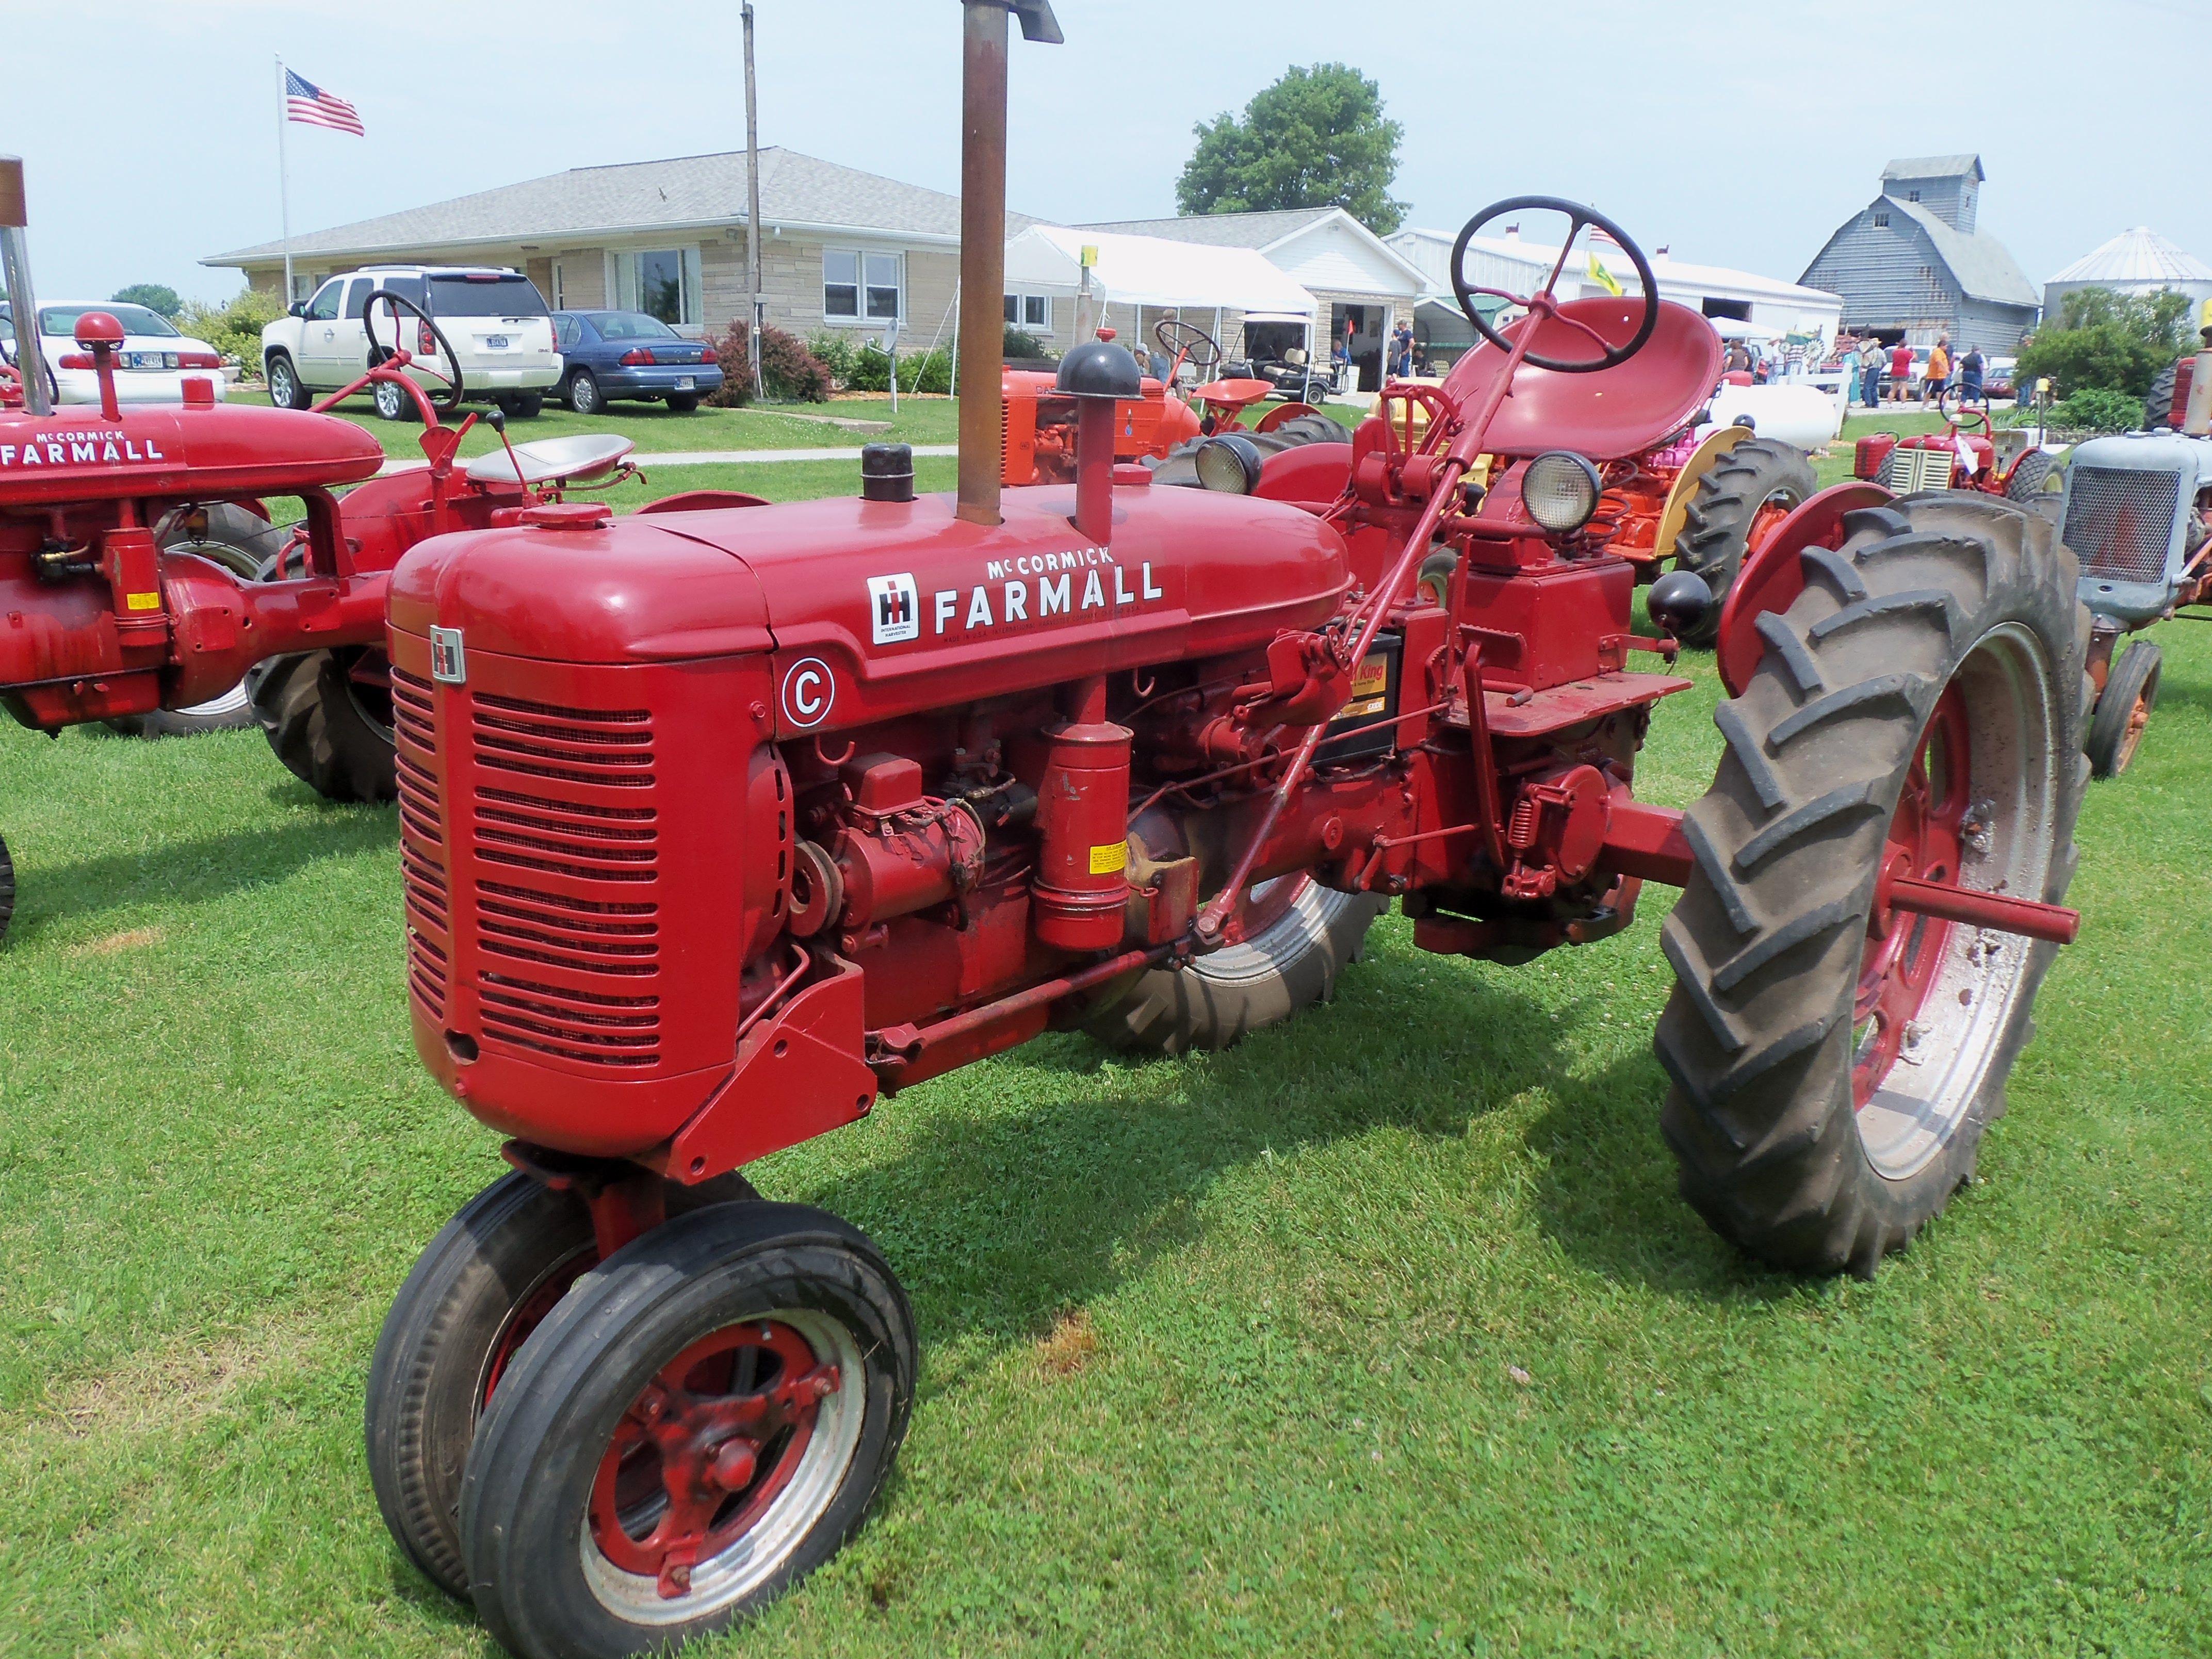 Farmall C Tractor : Farmall c tractor international harvester pinterest